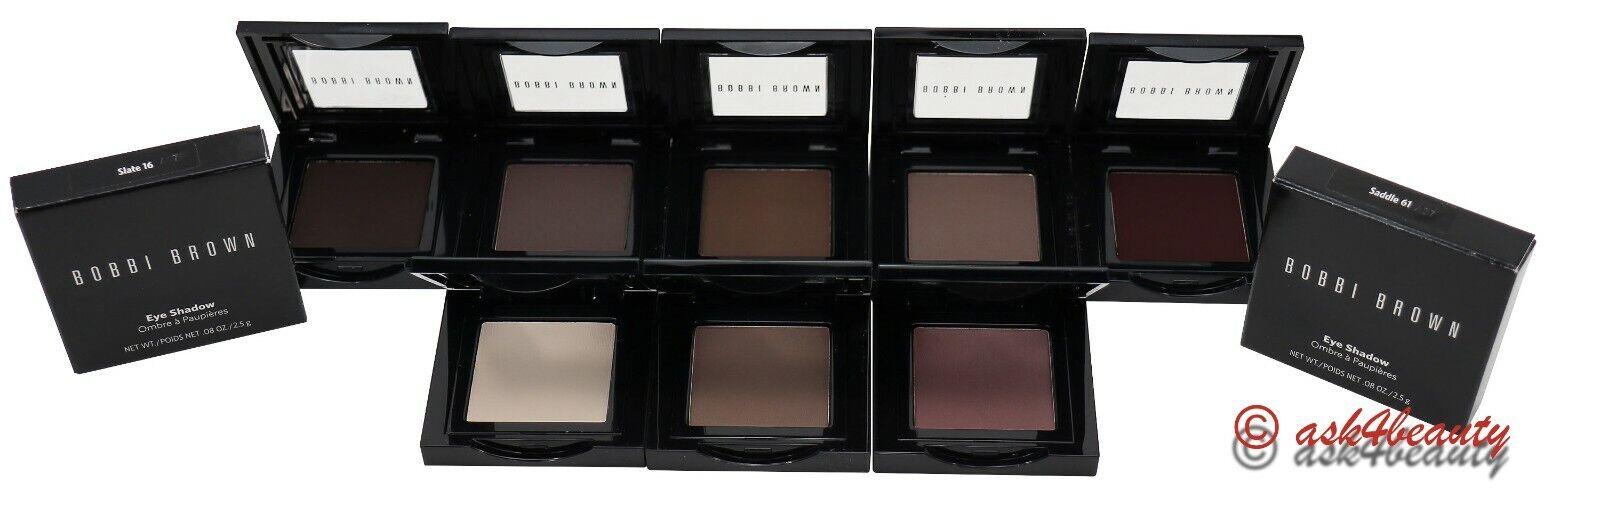 Bobbi Brown Eye shadow Choose Shade .08oz/2.5g New In Box